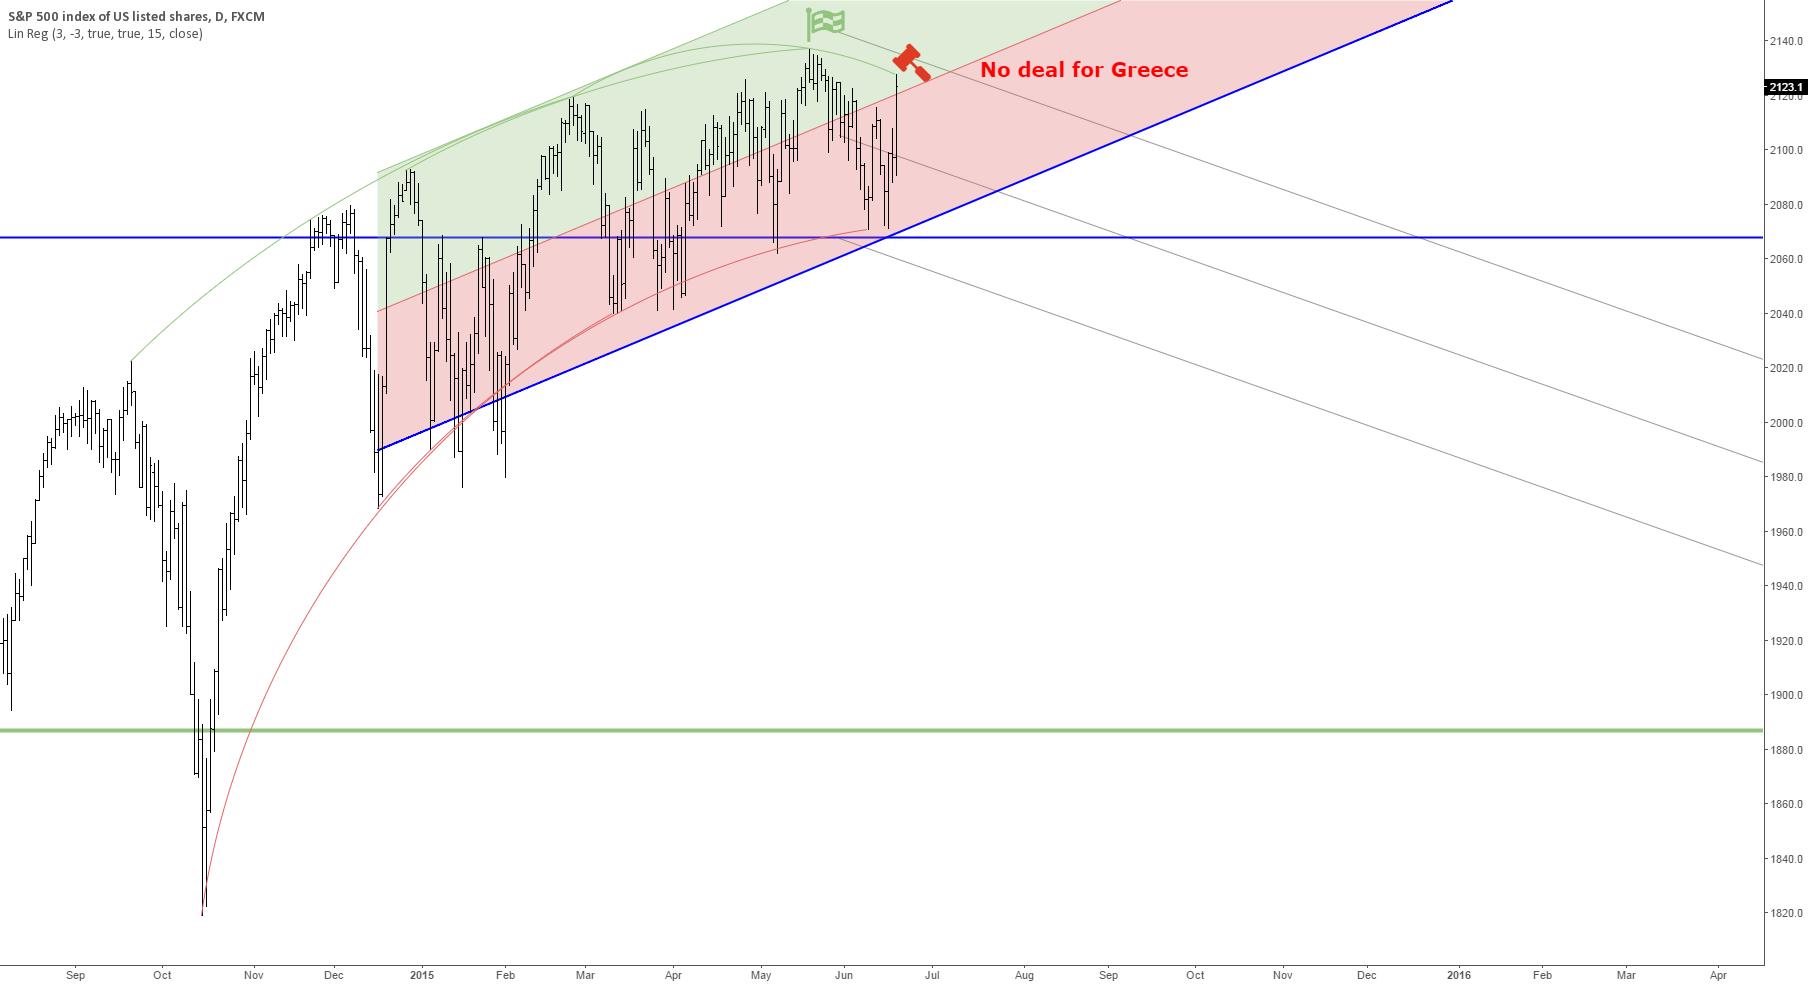 (S&P 500 crash scenario 2015 to 2016) No deal for Greece